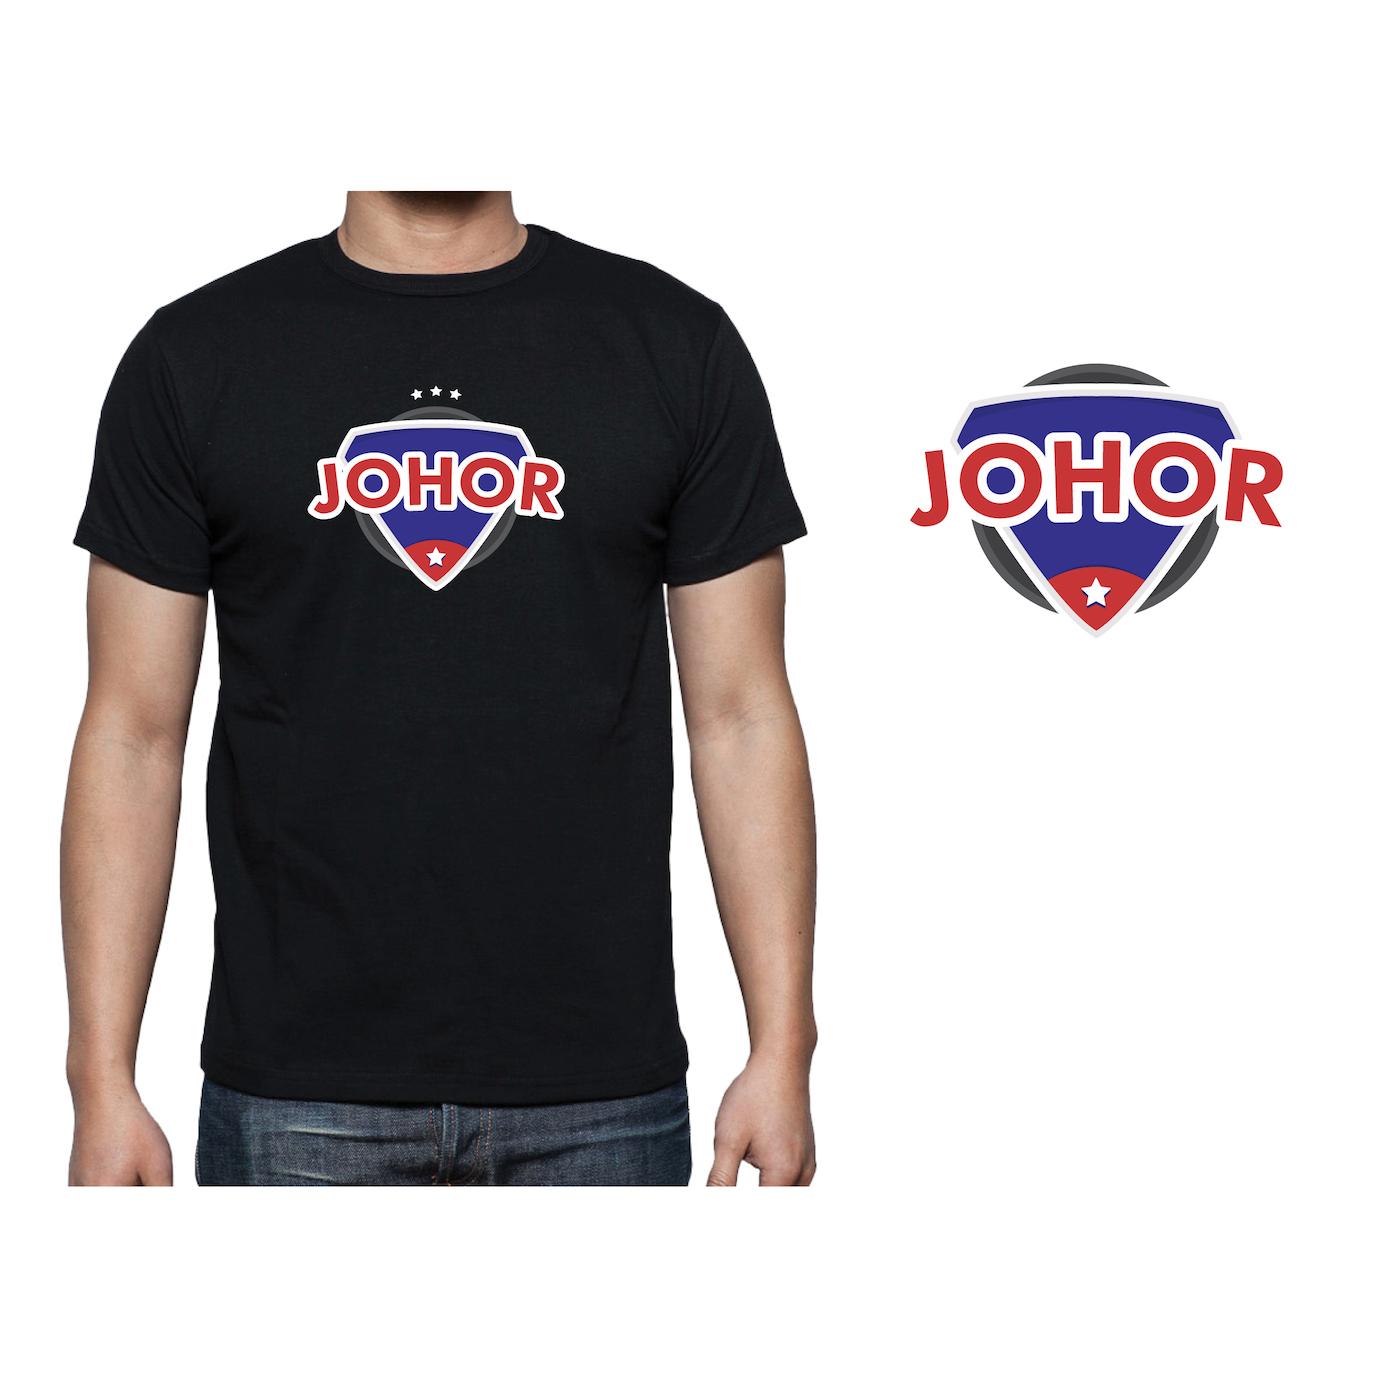 Design t shirt johor - Design 4